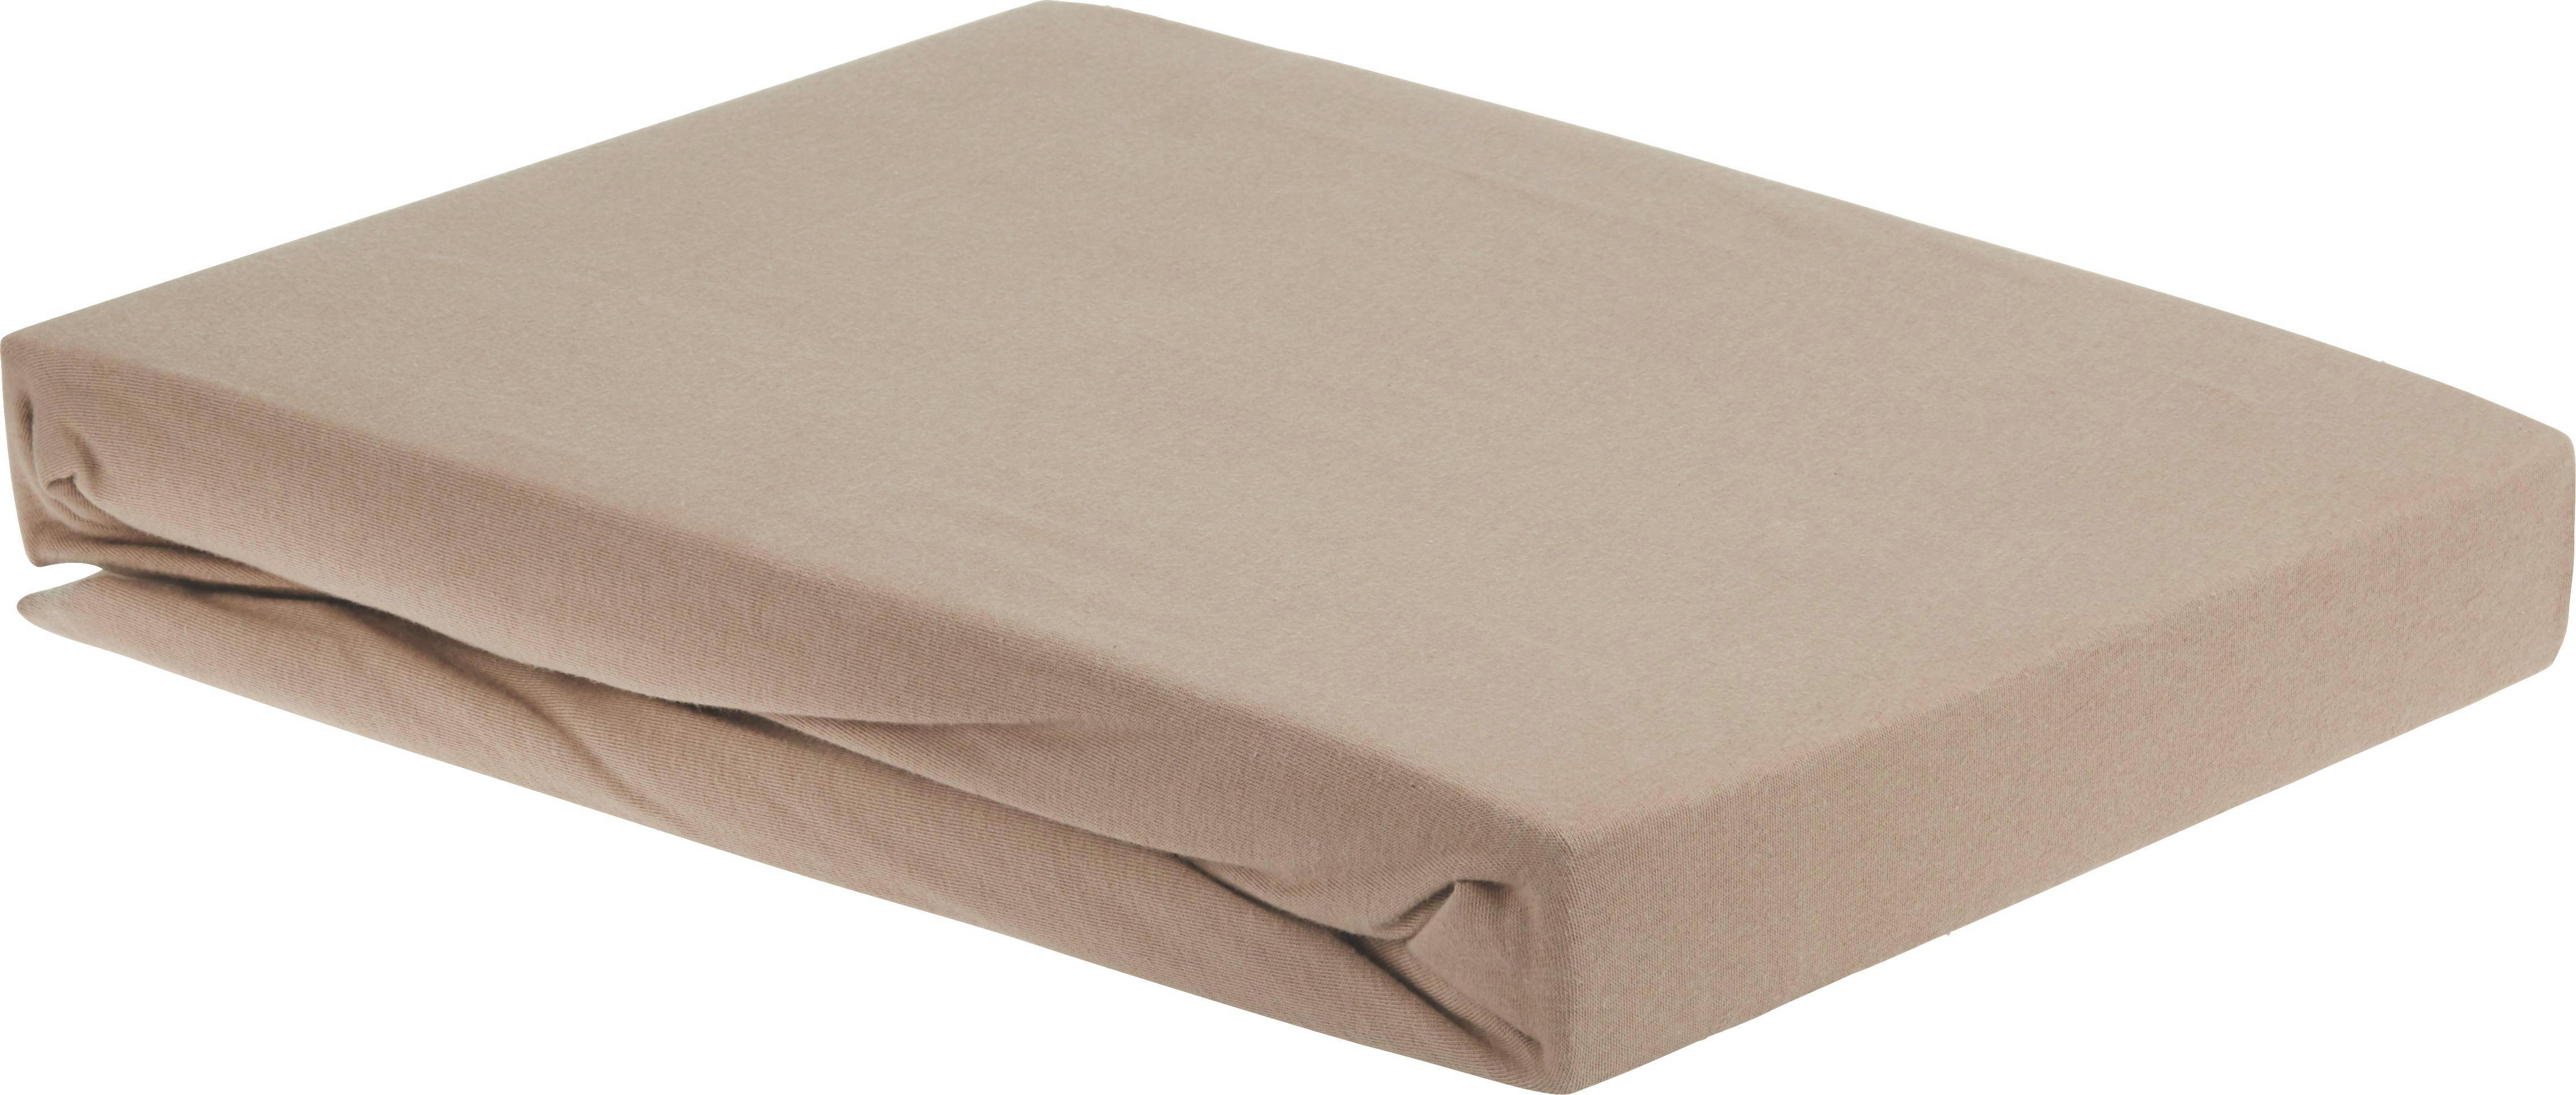 Gumis Lepedő Elasthan Hoch - szürkésbarna, textil (180/200cm) - premium living